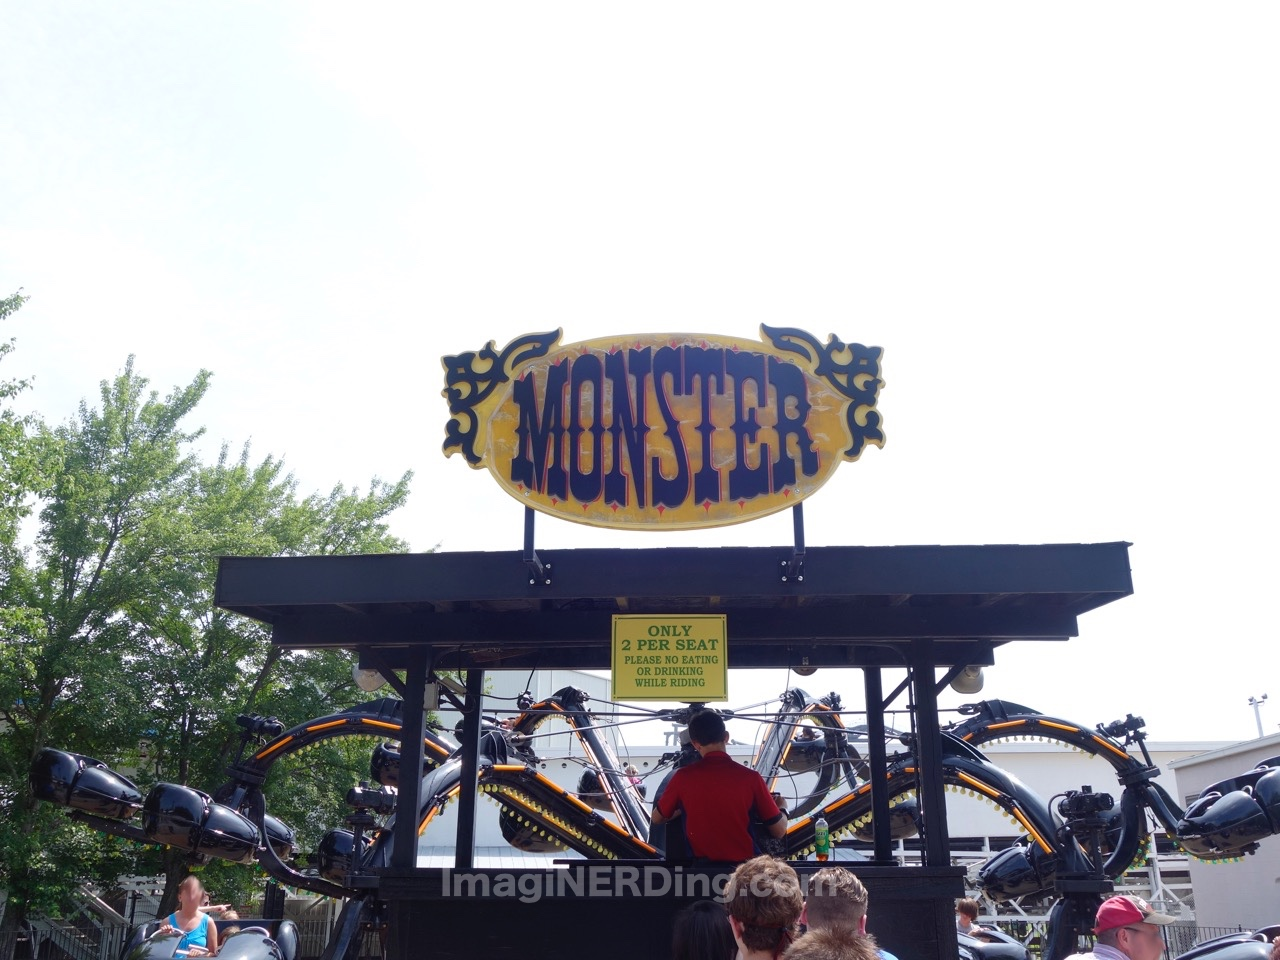 monster at kings island imaginerding